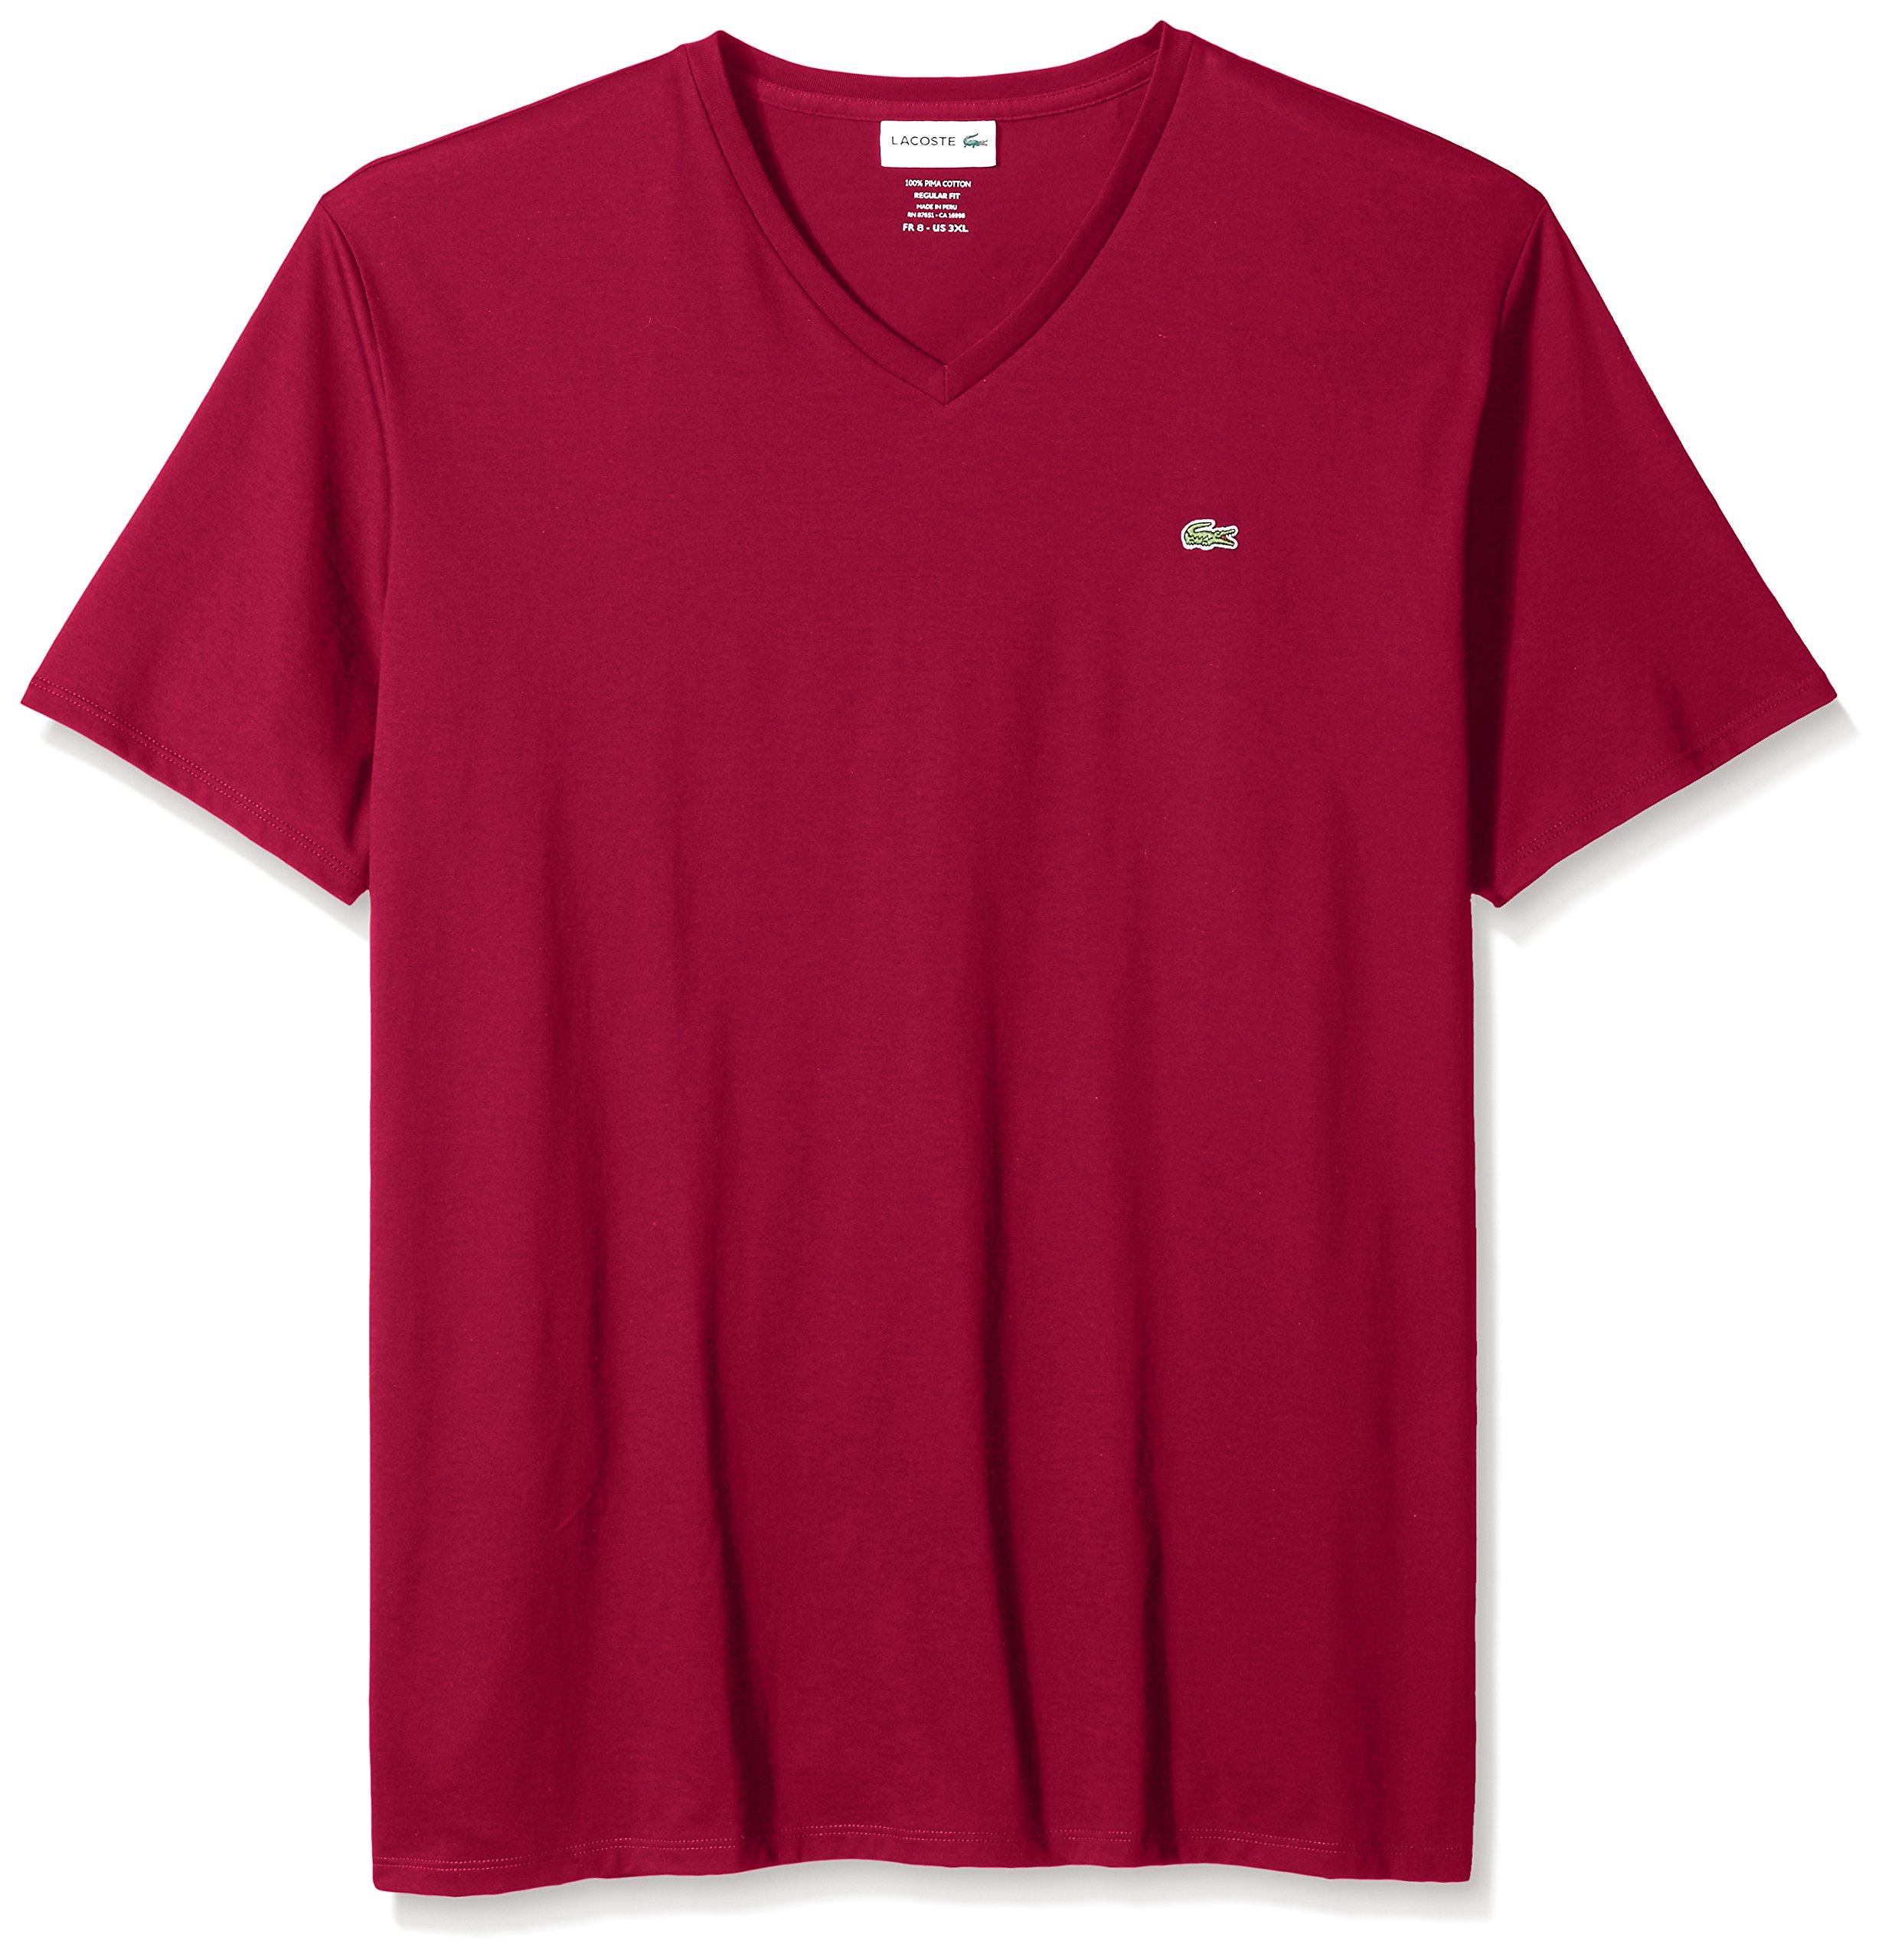 Lacoste Men's Short Sleeve V Neck Pima Jersey T-Shirt, TH6710, Bordeaux, Medium